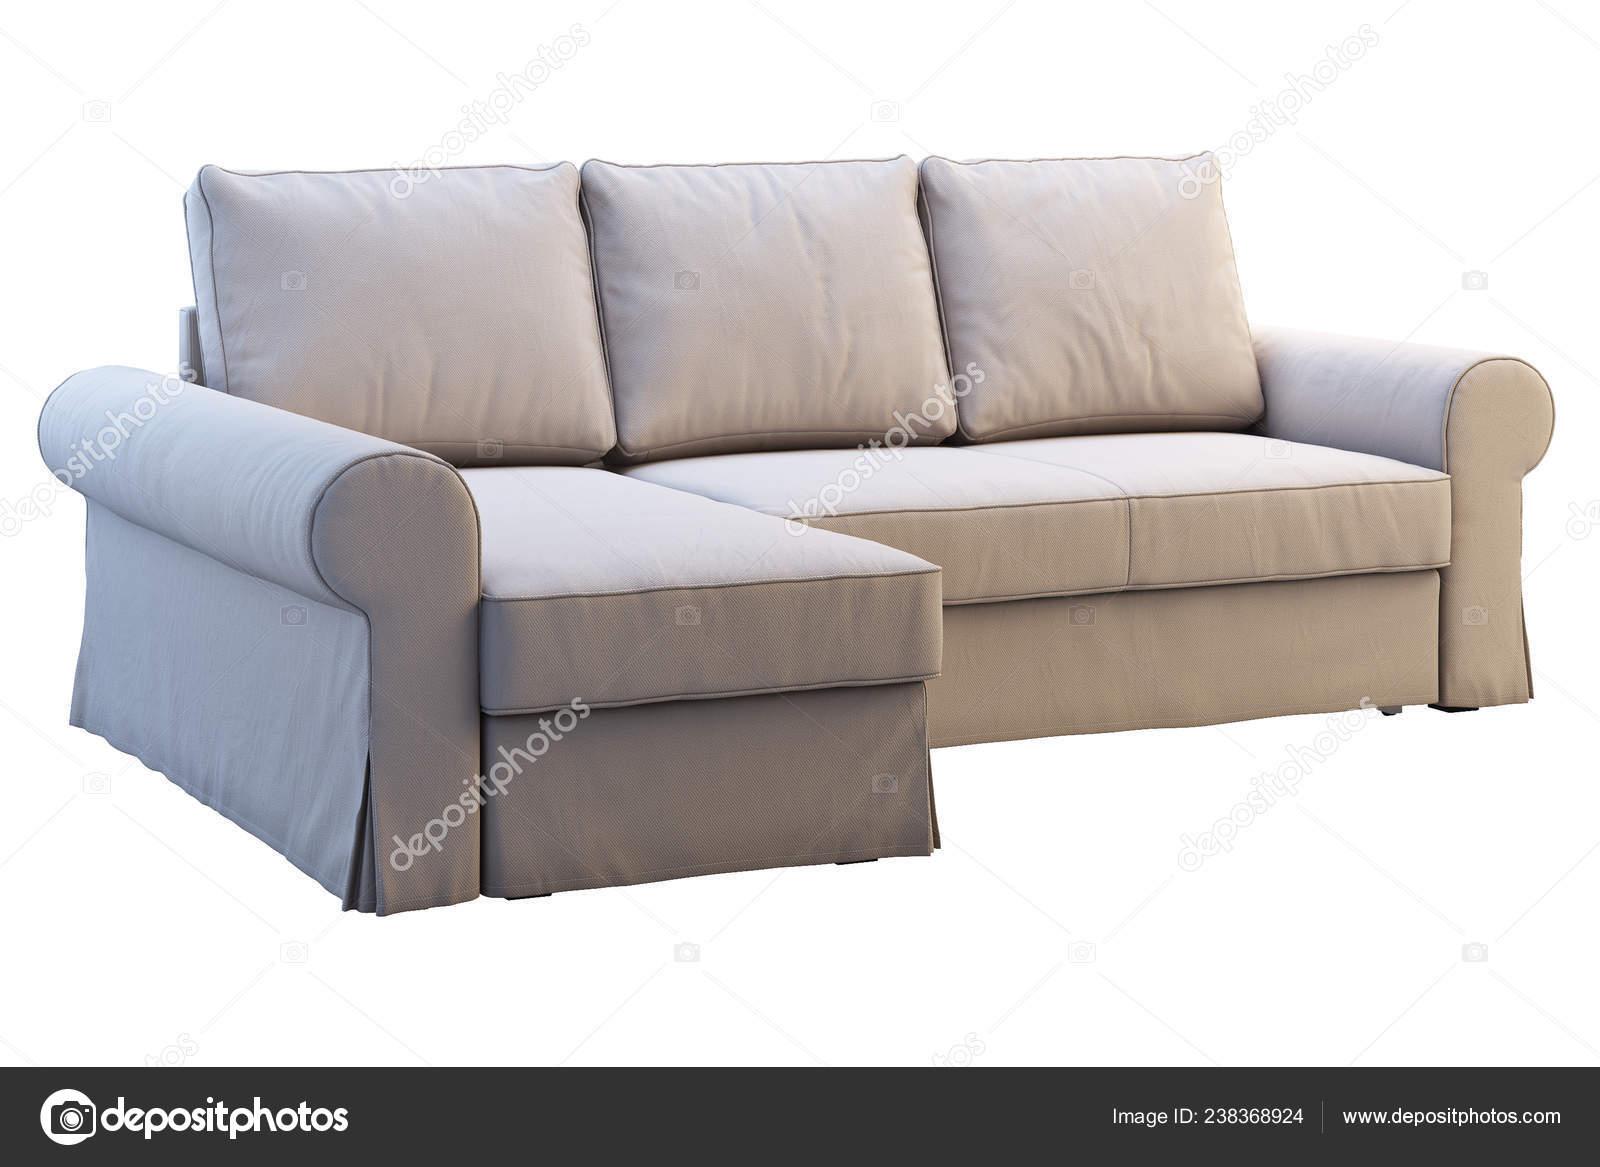 Modern Beige Fabric Sofa Chaise Lounge White Background Scandinavian Interior Stock Photo C 3dmitruk 238368924